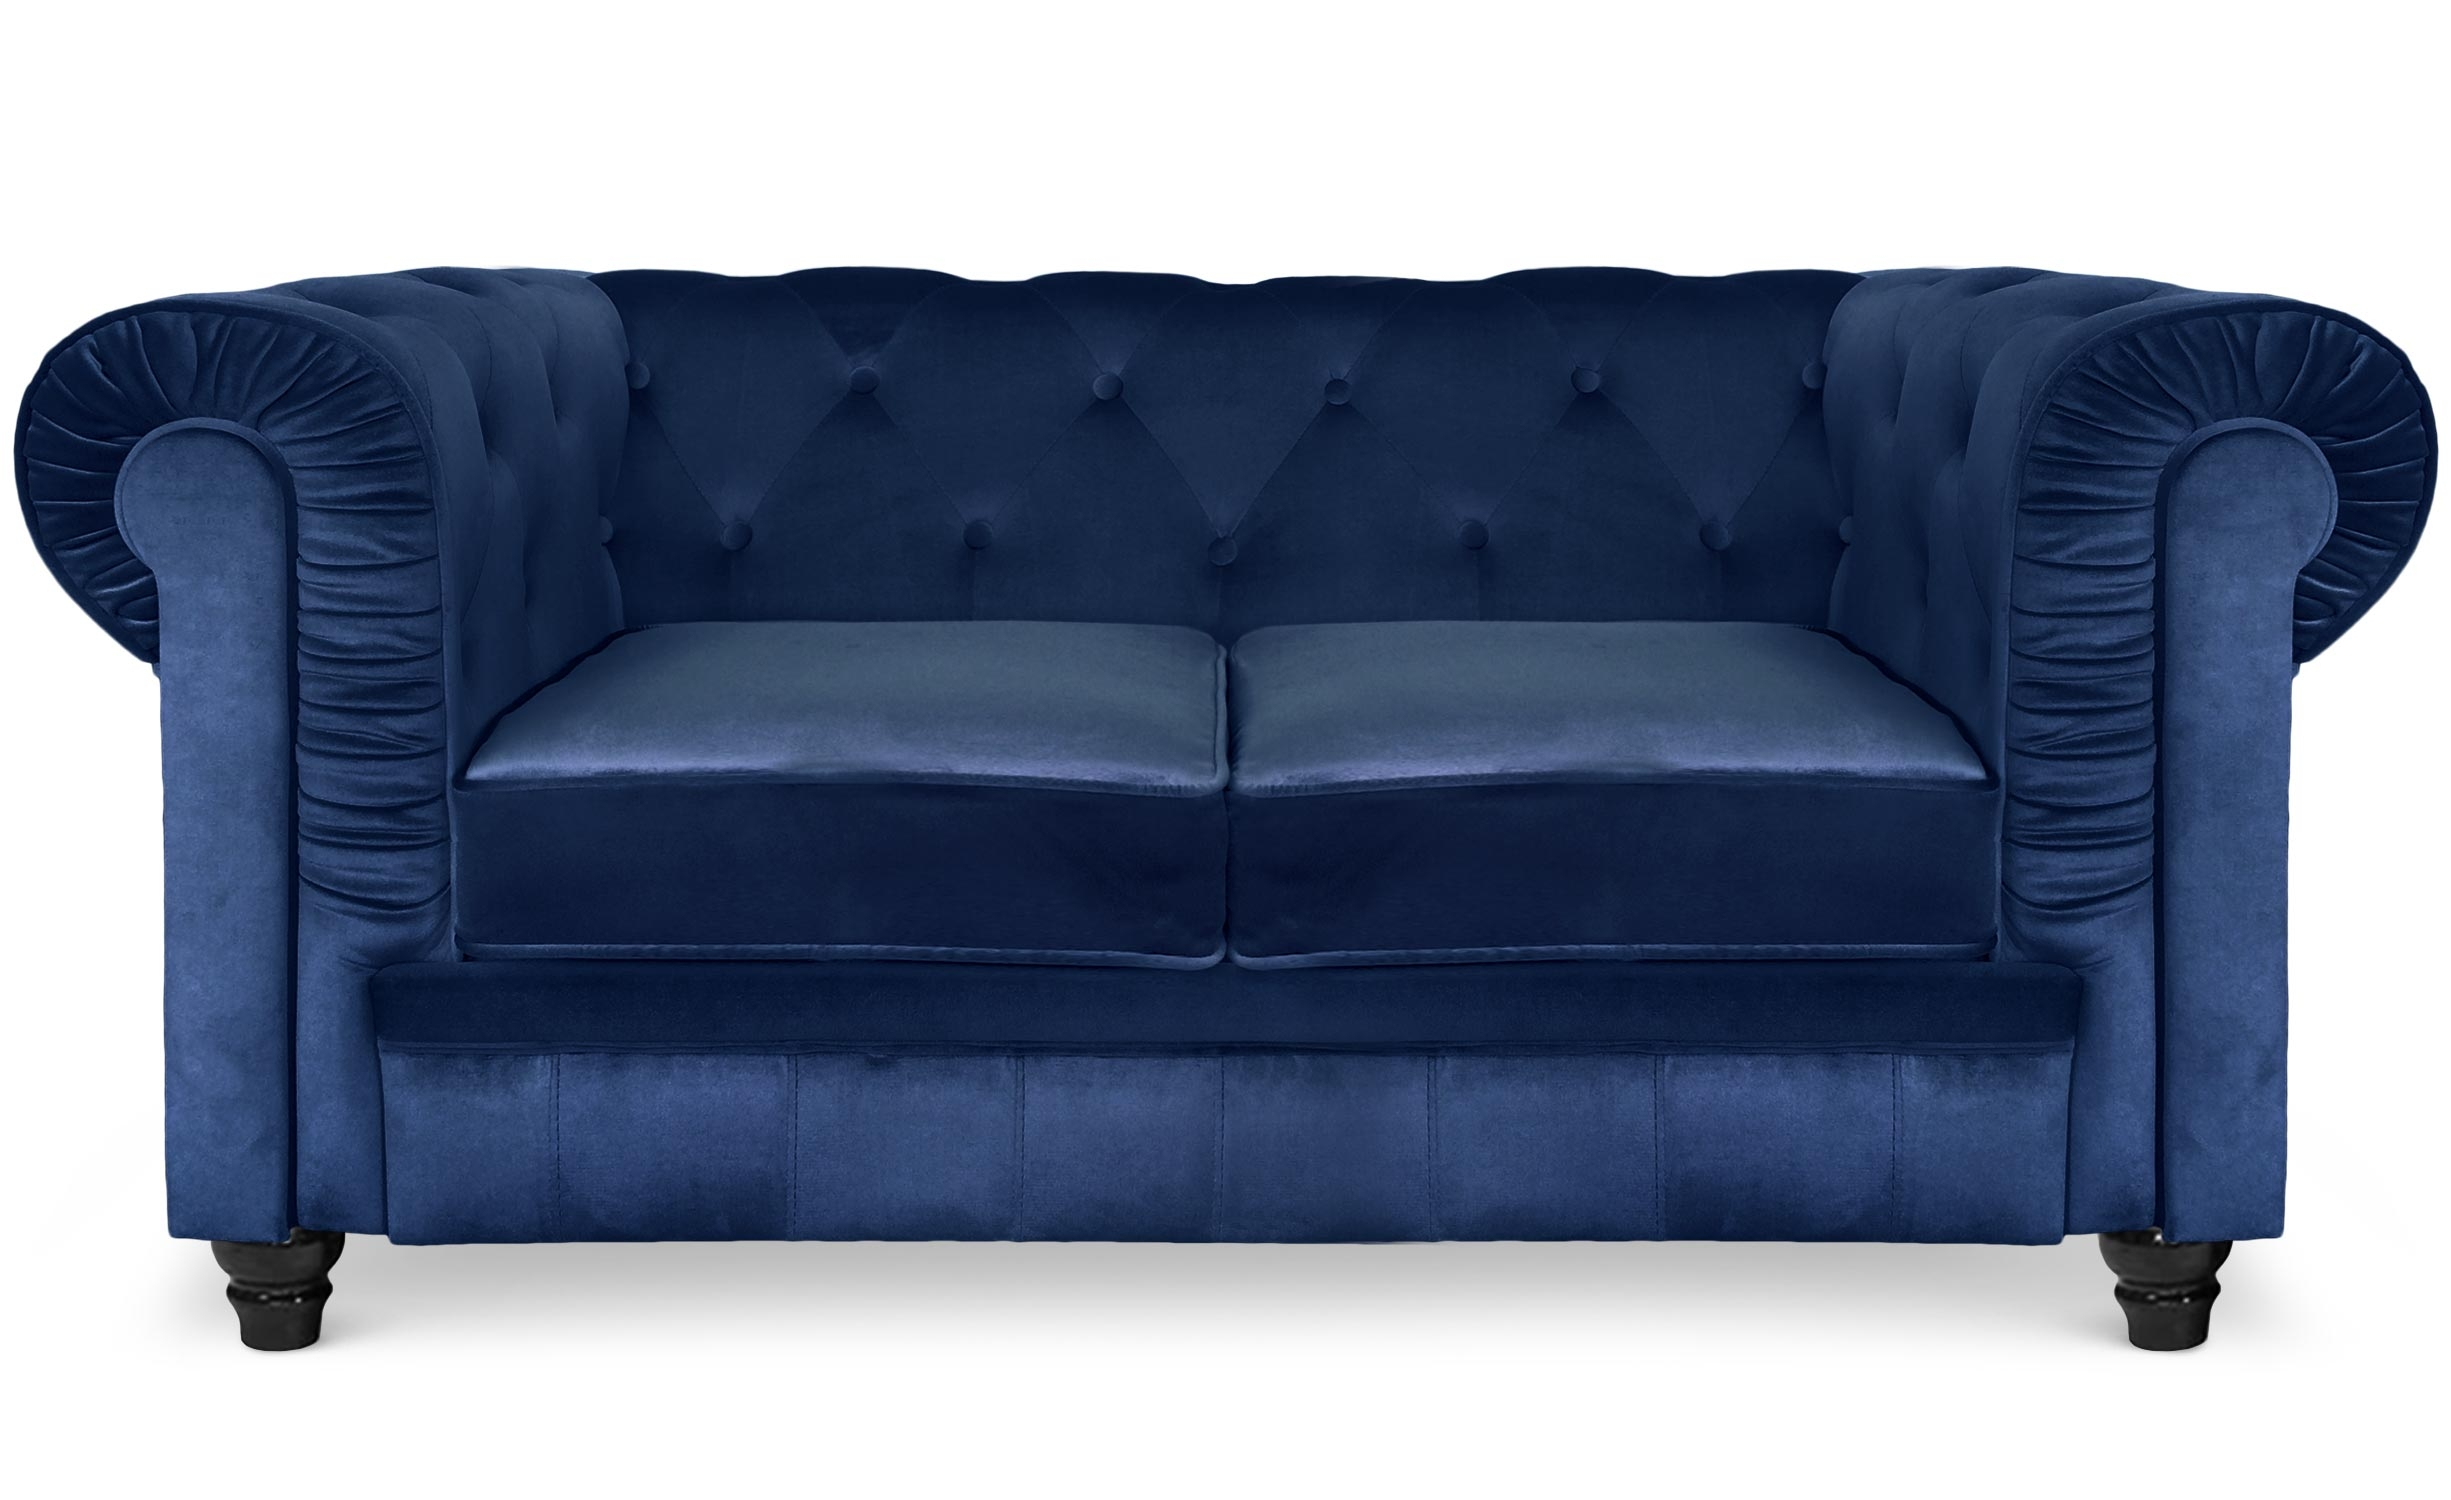 Grand Canapé Chesterfield 2-Sitzer Sofa mit Samtbezug Blau